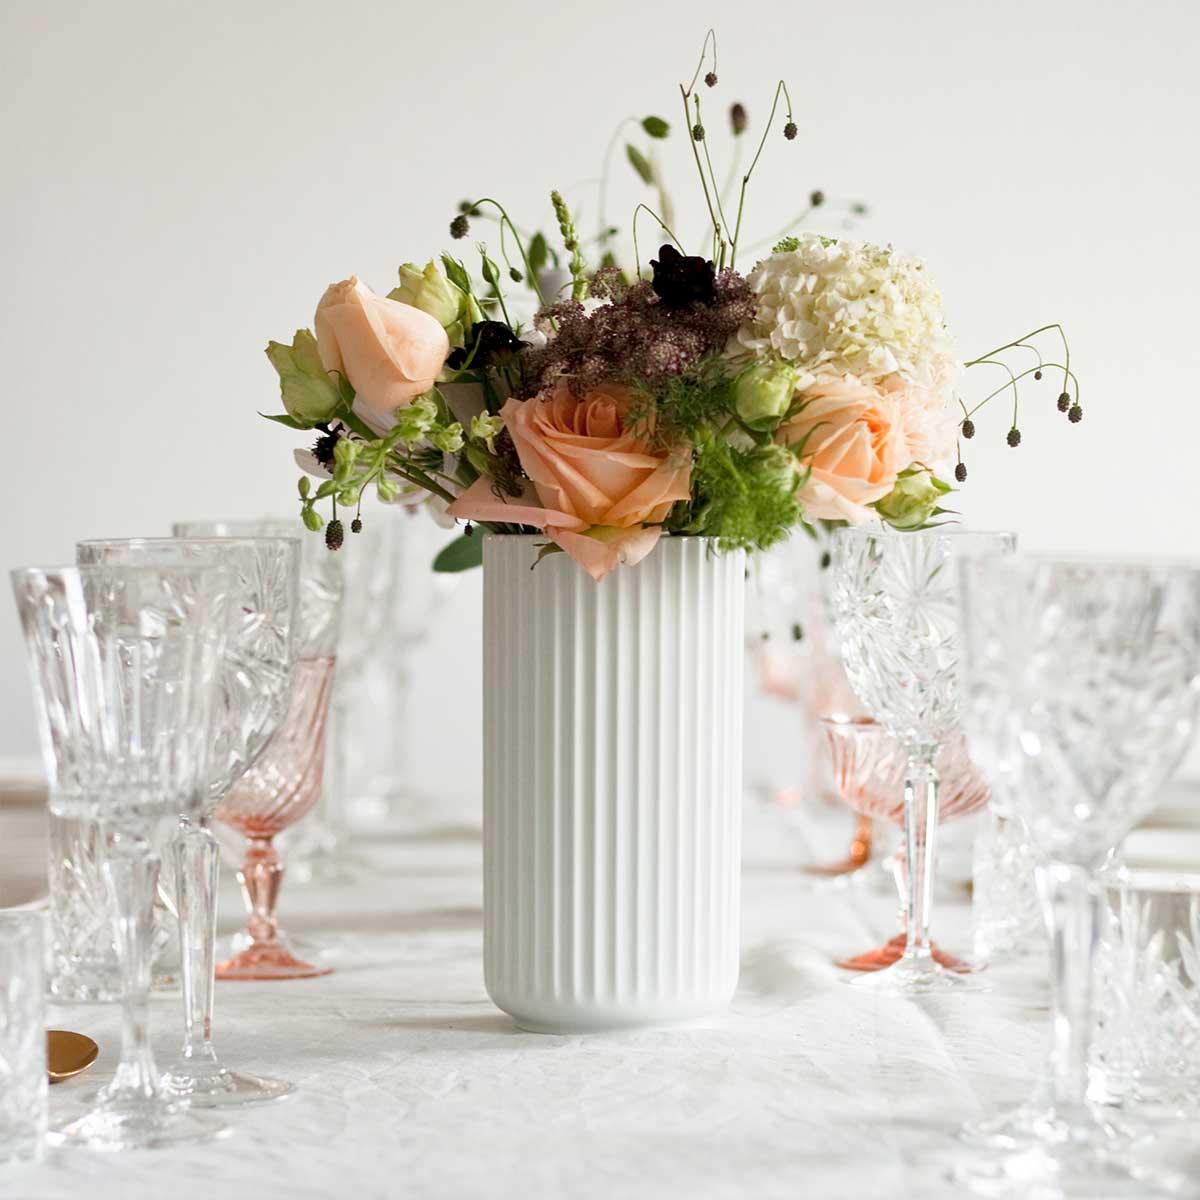 15 cm Lyngby porcelain vase porcelaine noir